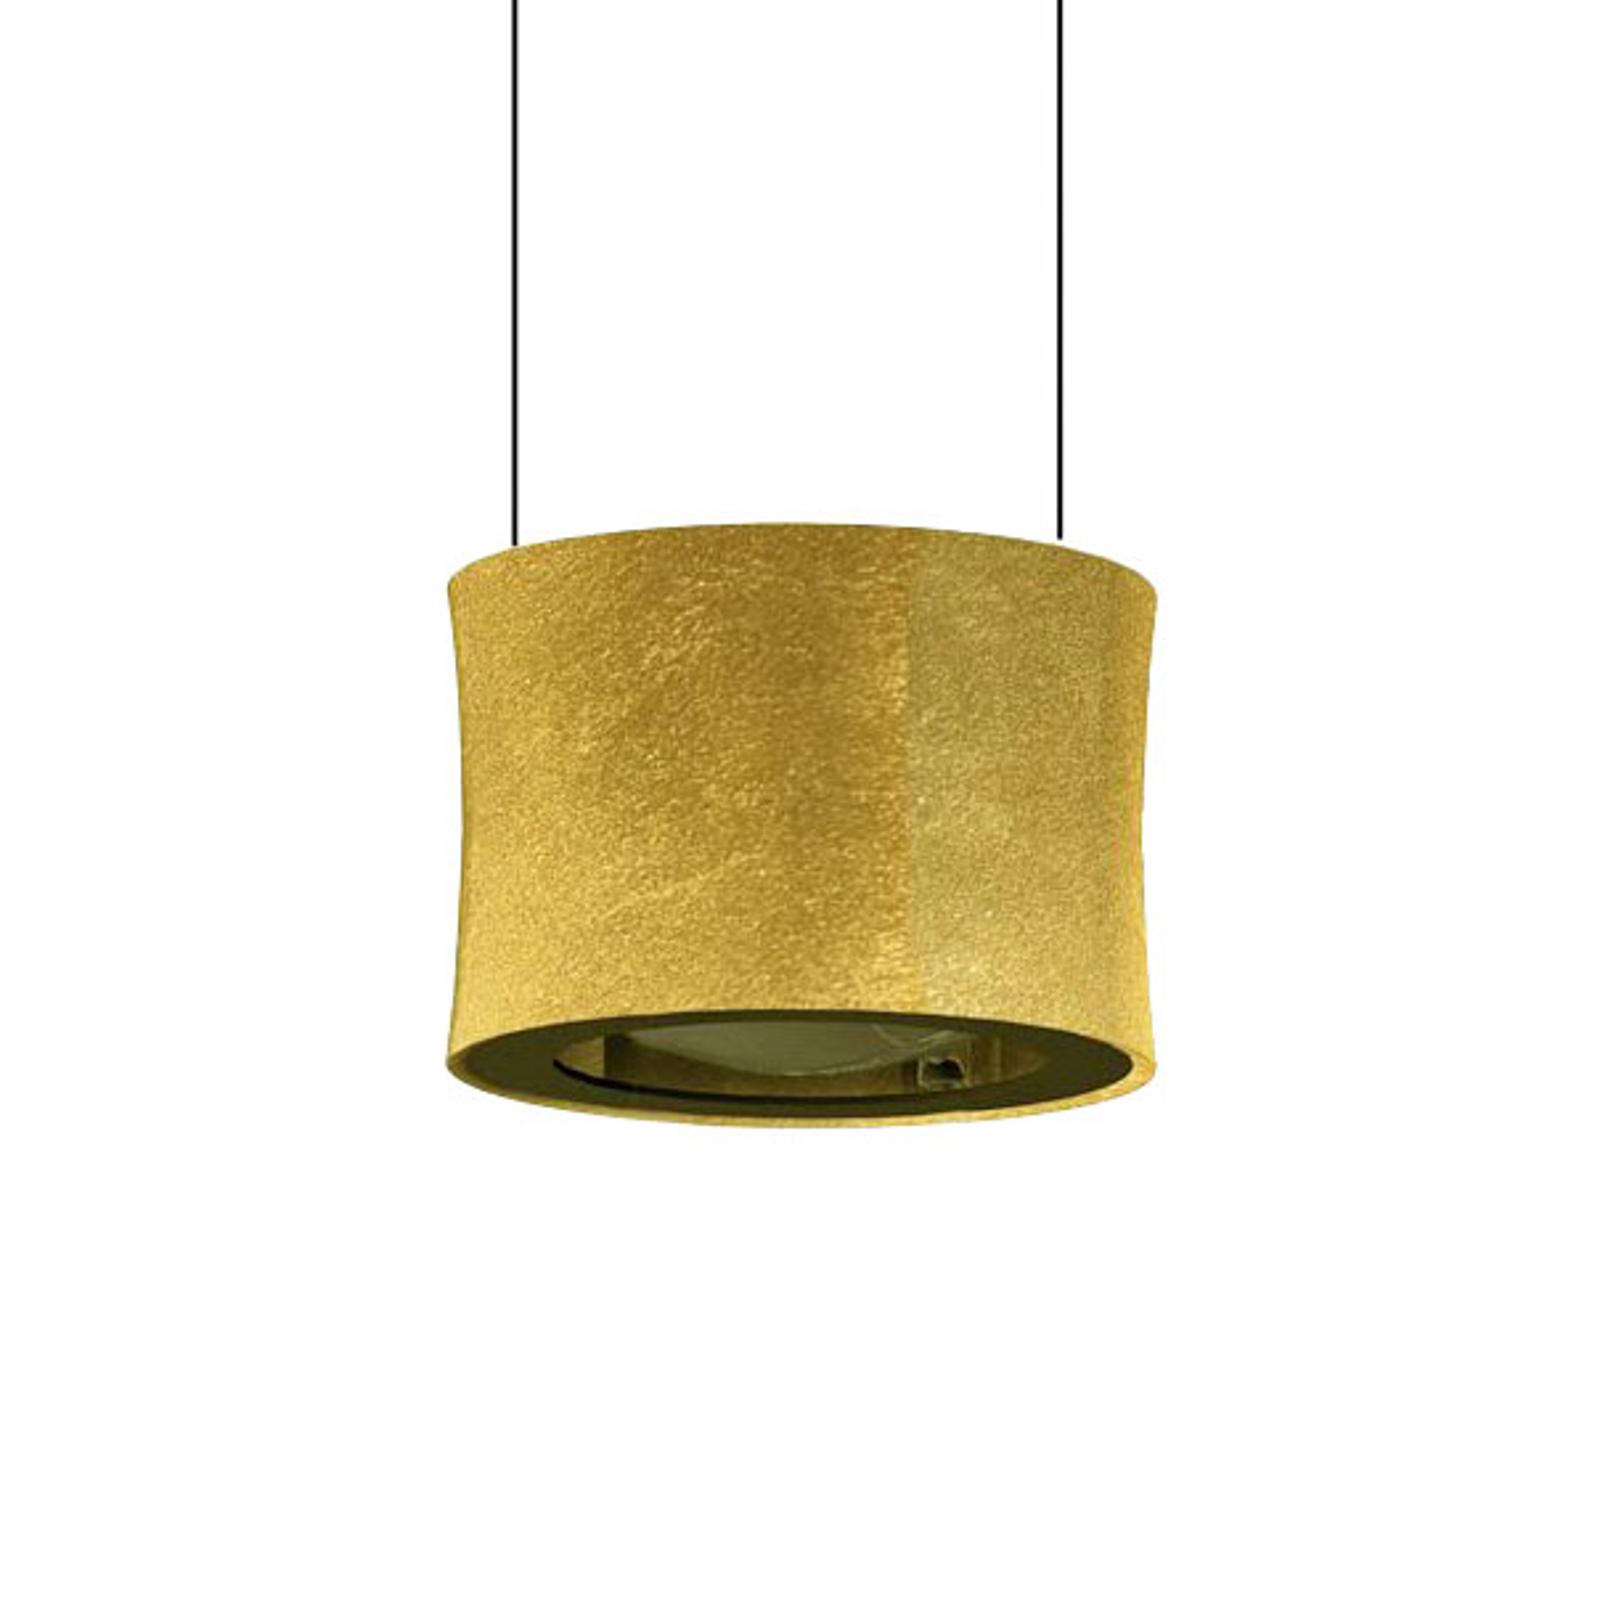 BANKAMP Impulse LED-Hängeleuchte 1-flammig gold